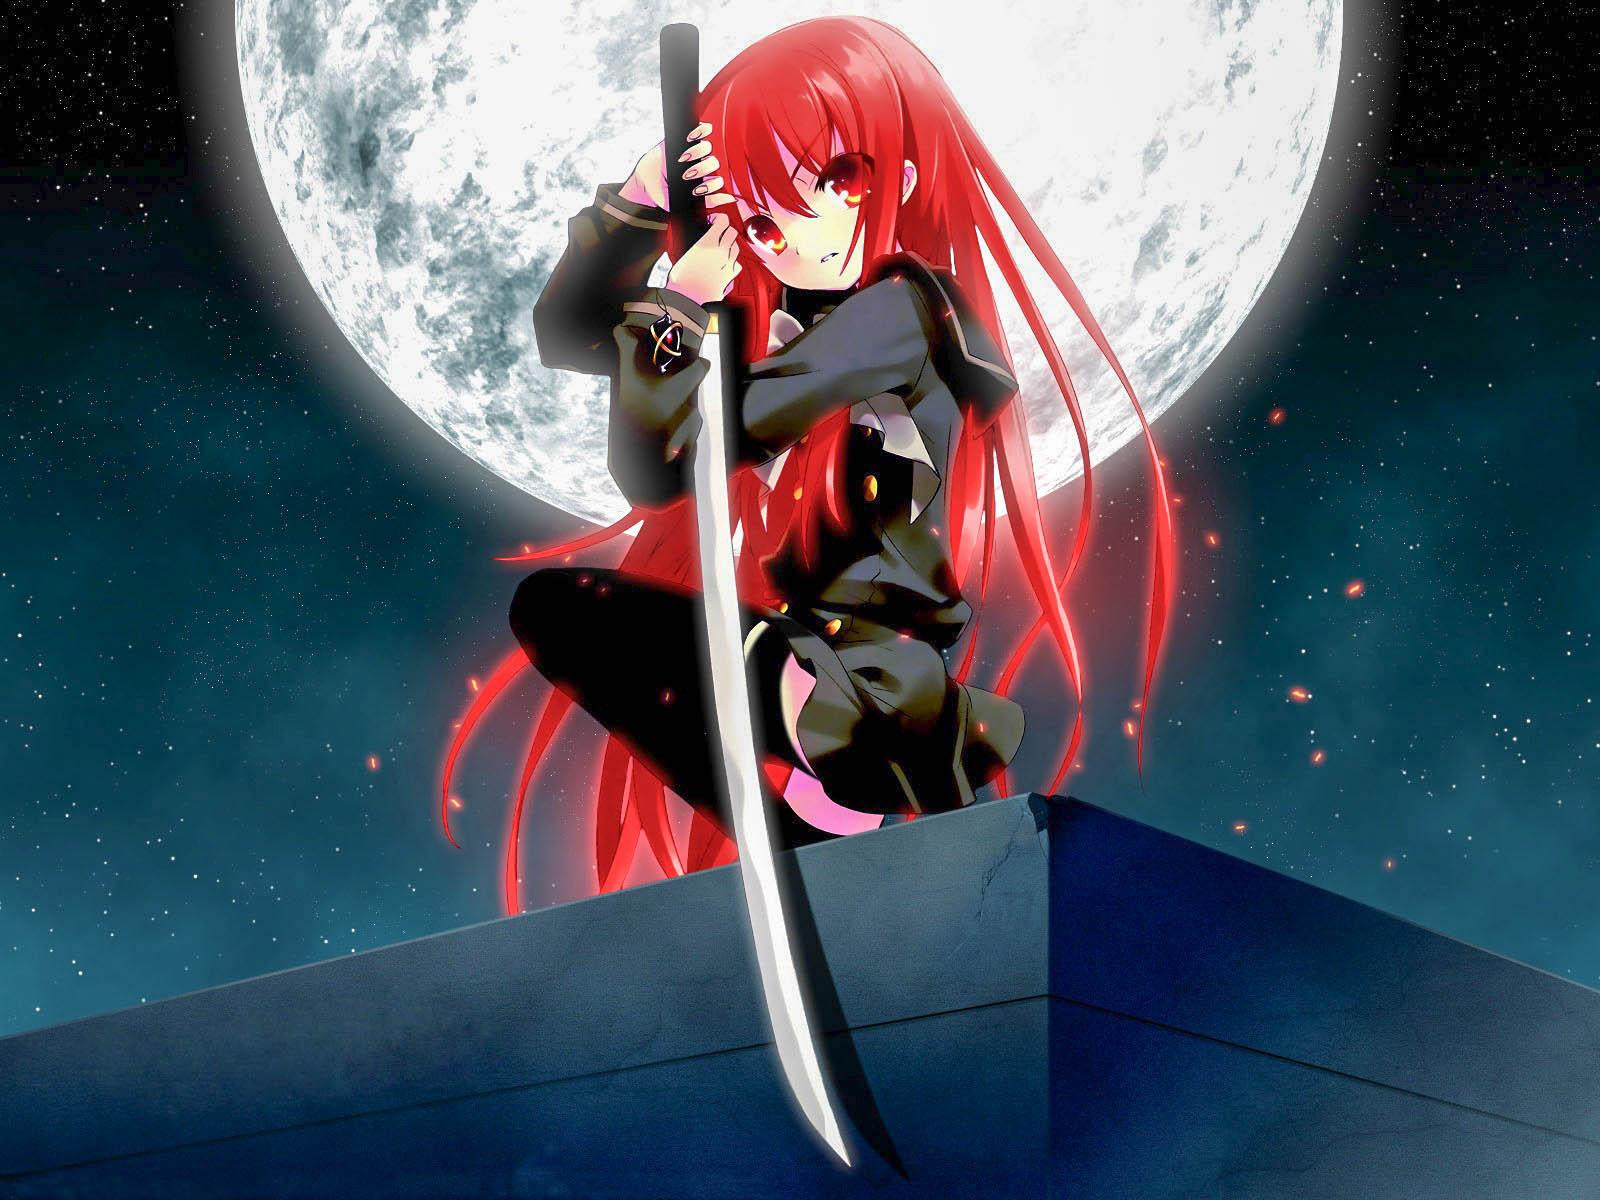 Cute Anime Ninja Girl - 1600x1200 ...